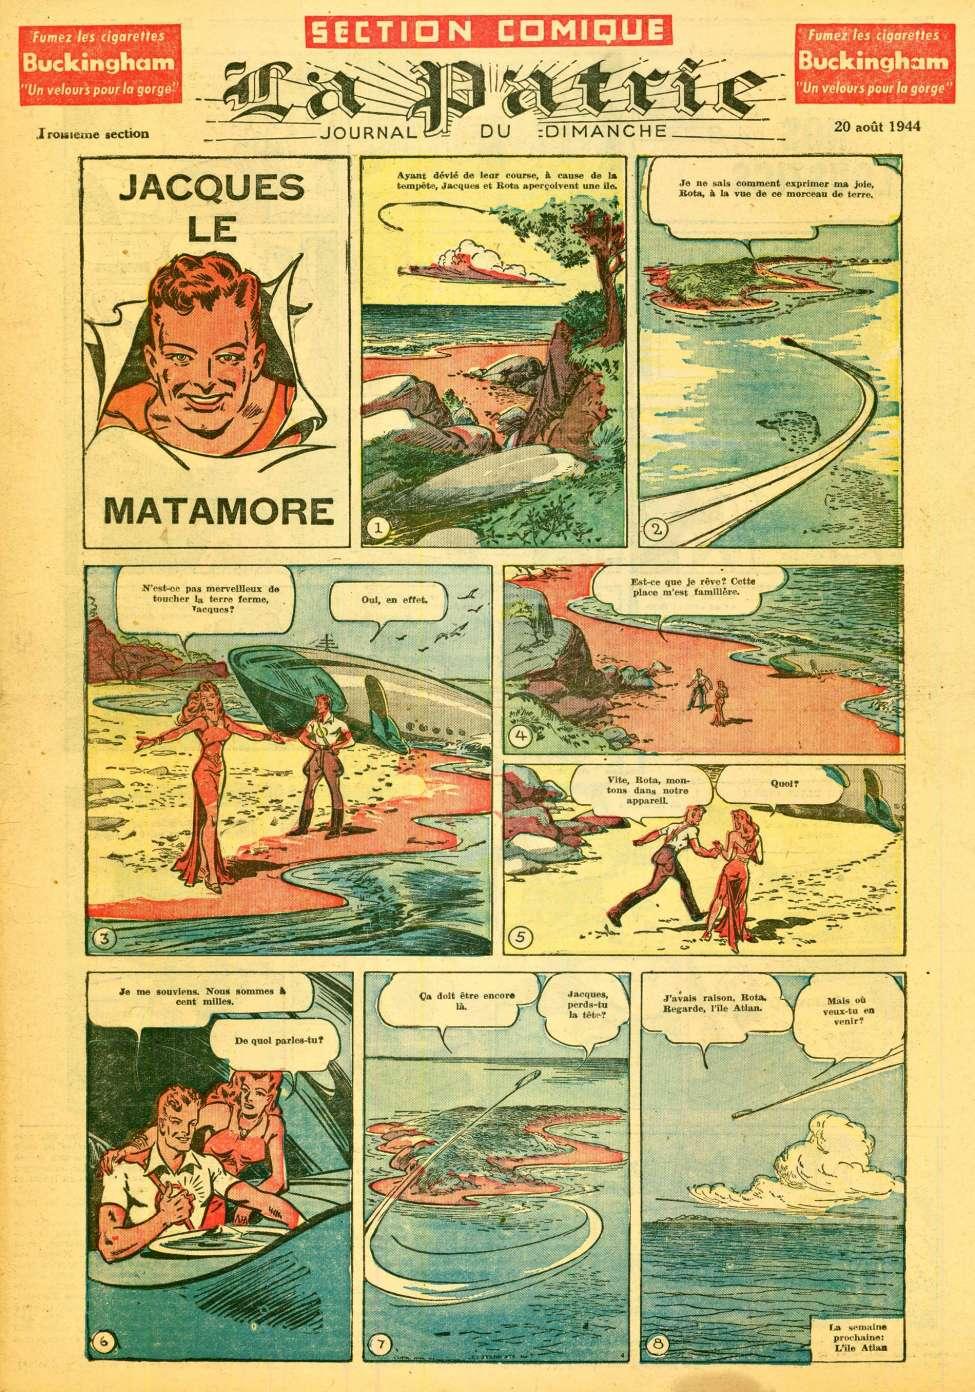 Comic Book Cover For La Patrie - Section Comique (1944-08-20)